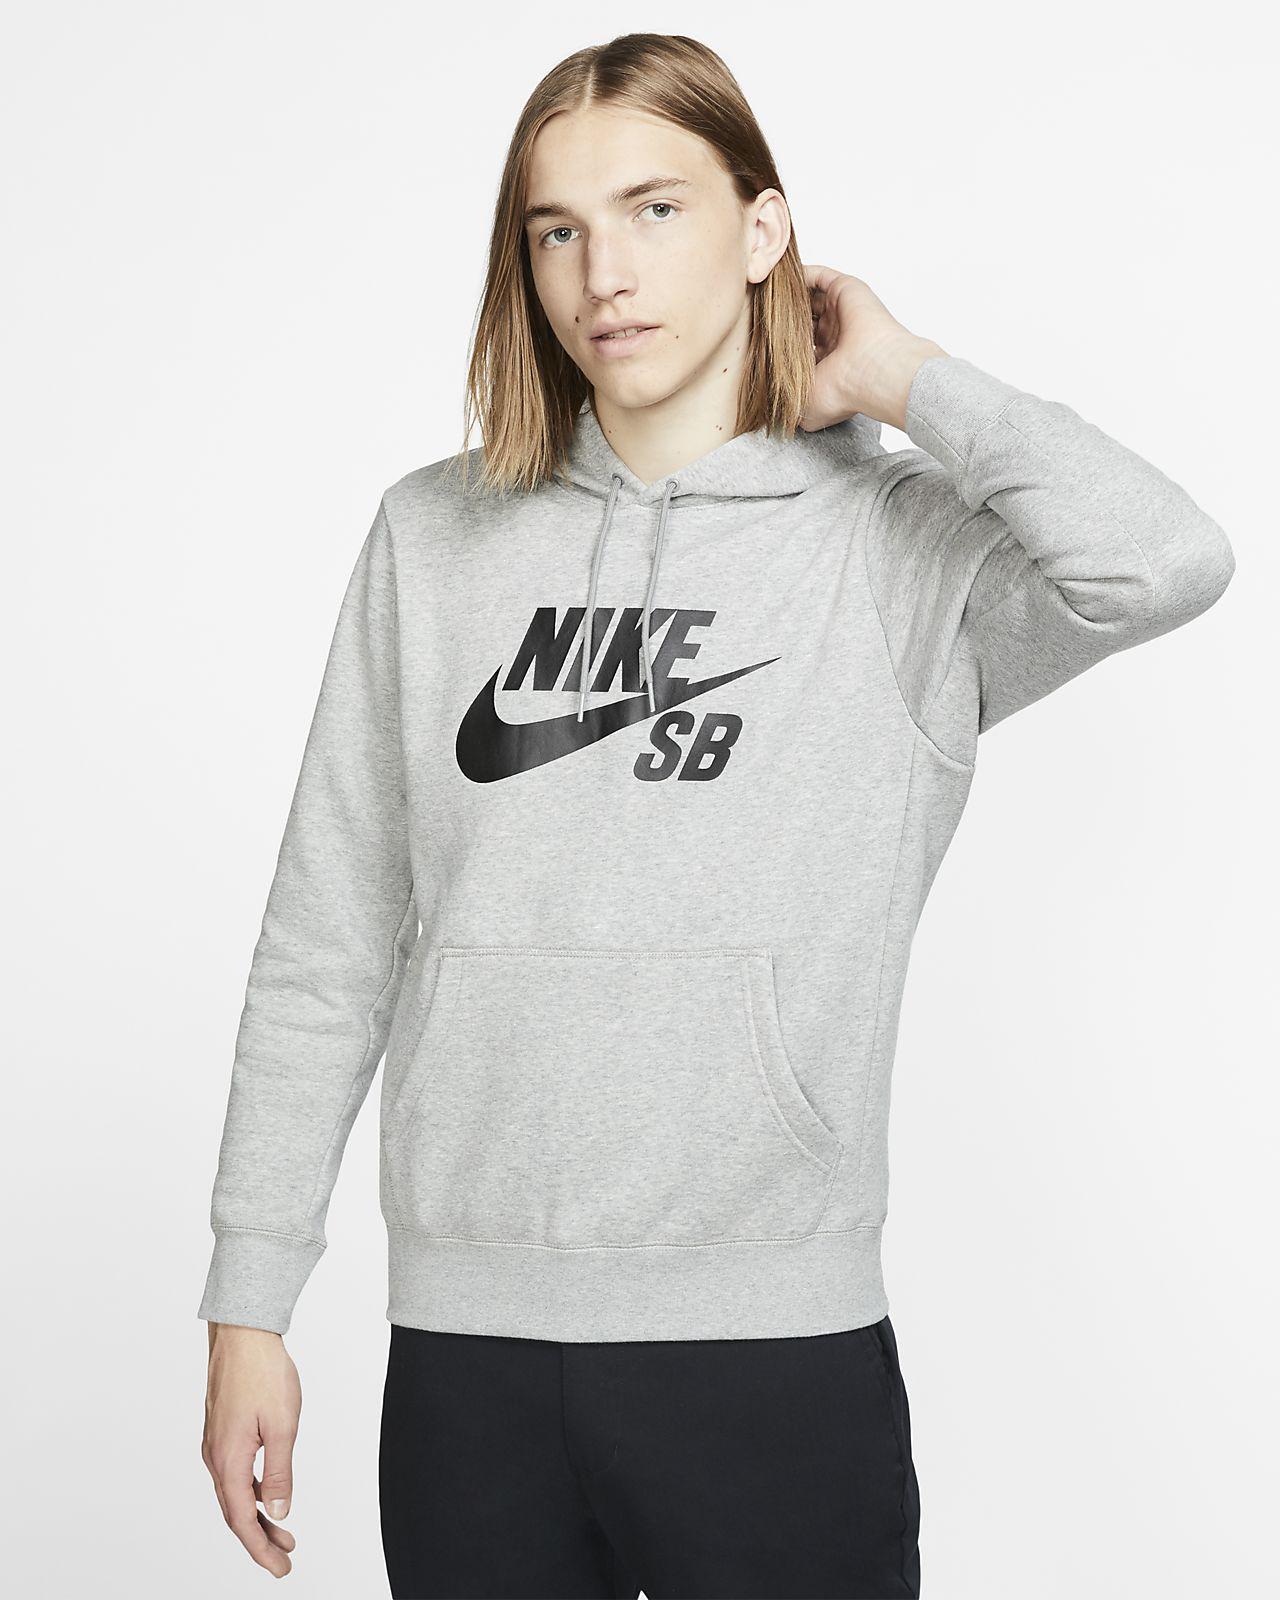 nike skateboarding sweatshirt